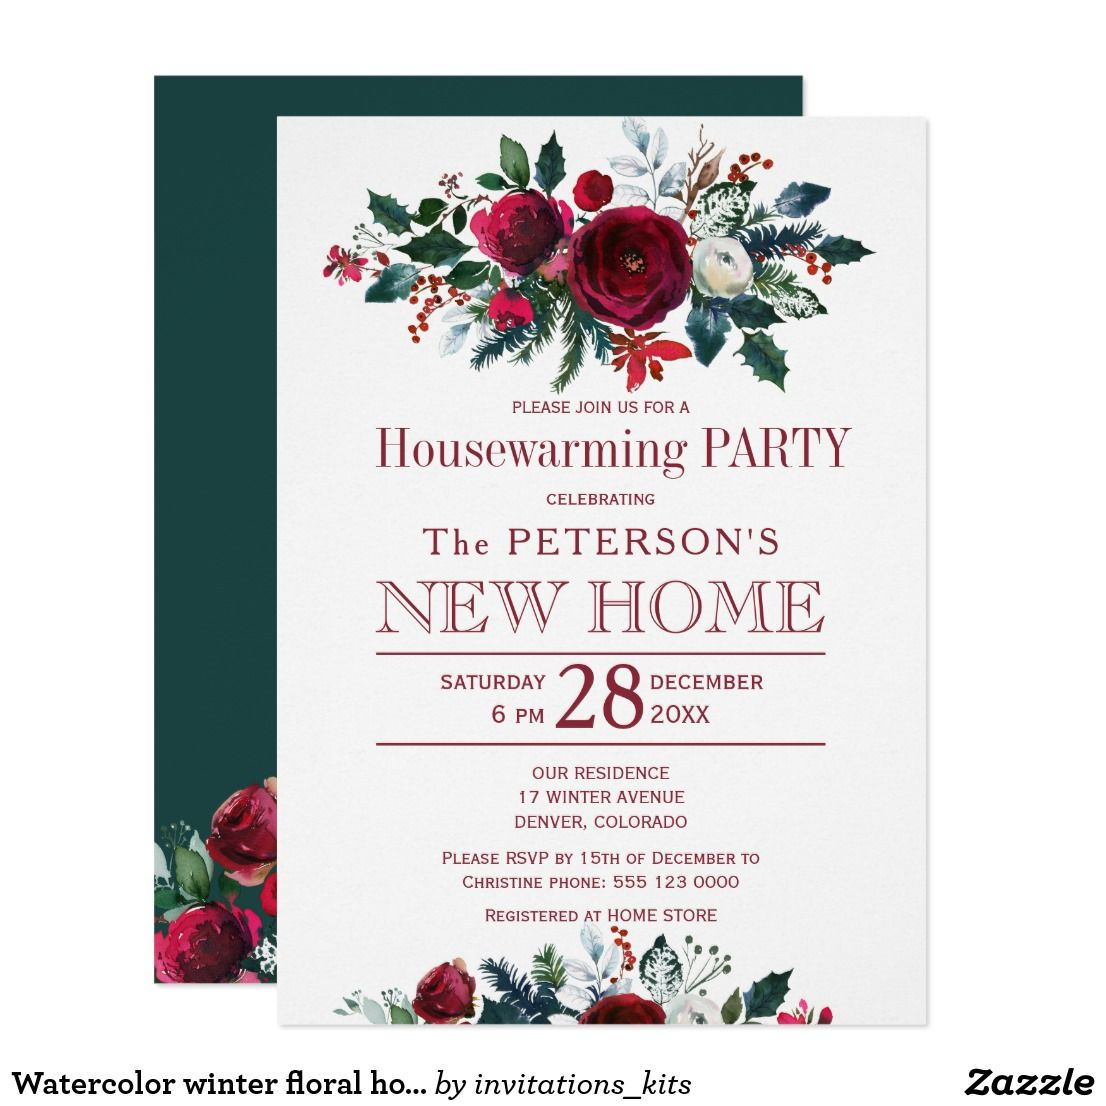 Watercolor winter floral housewarming party card   Housewarming ...